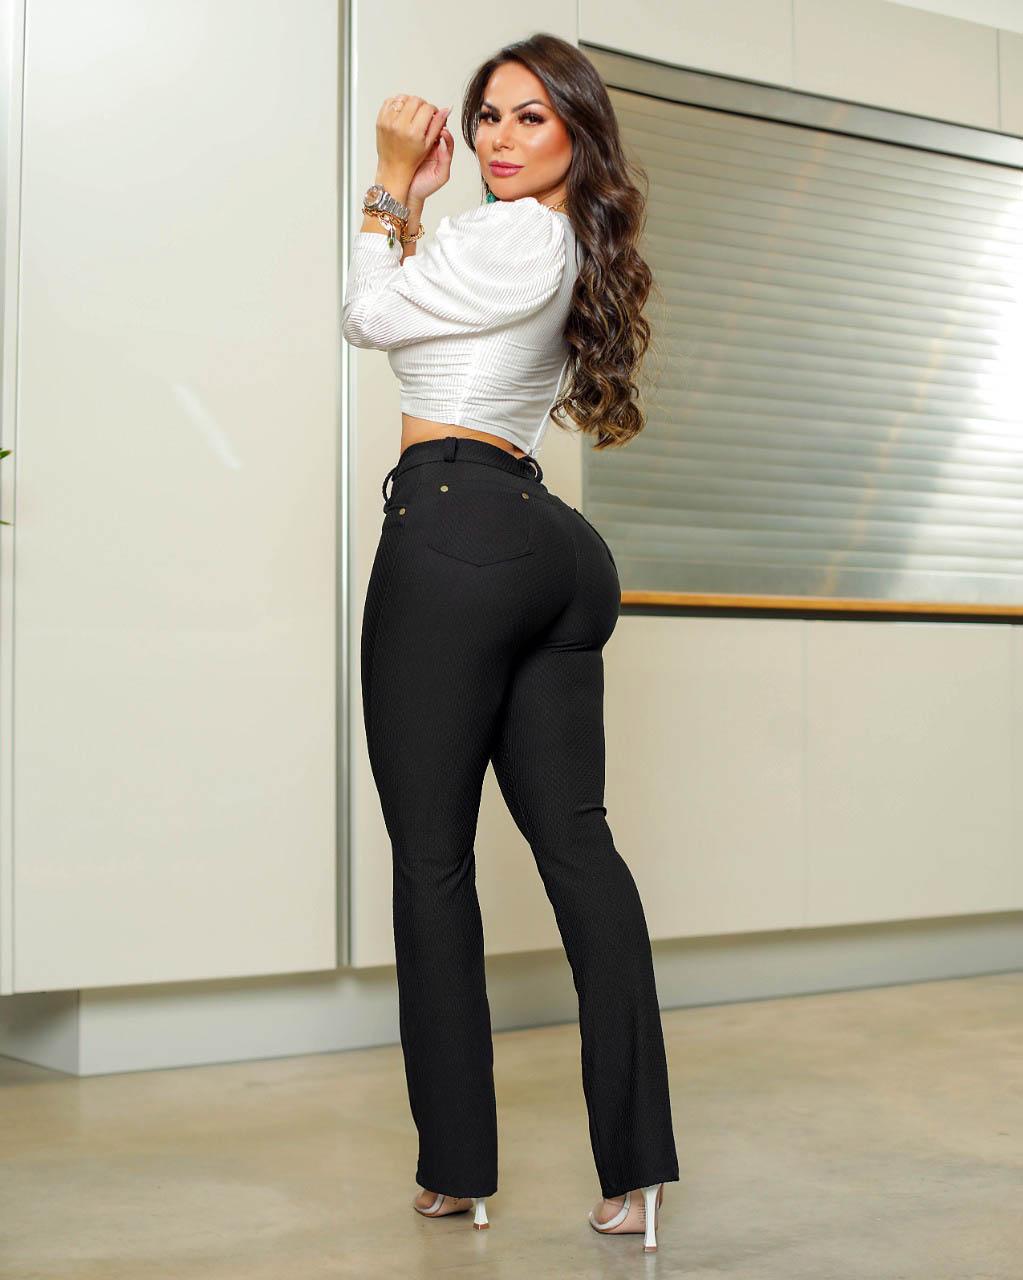 Calça Legging Modeladora Preta - Empina Bumbum e Comprime a Barriga